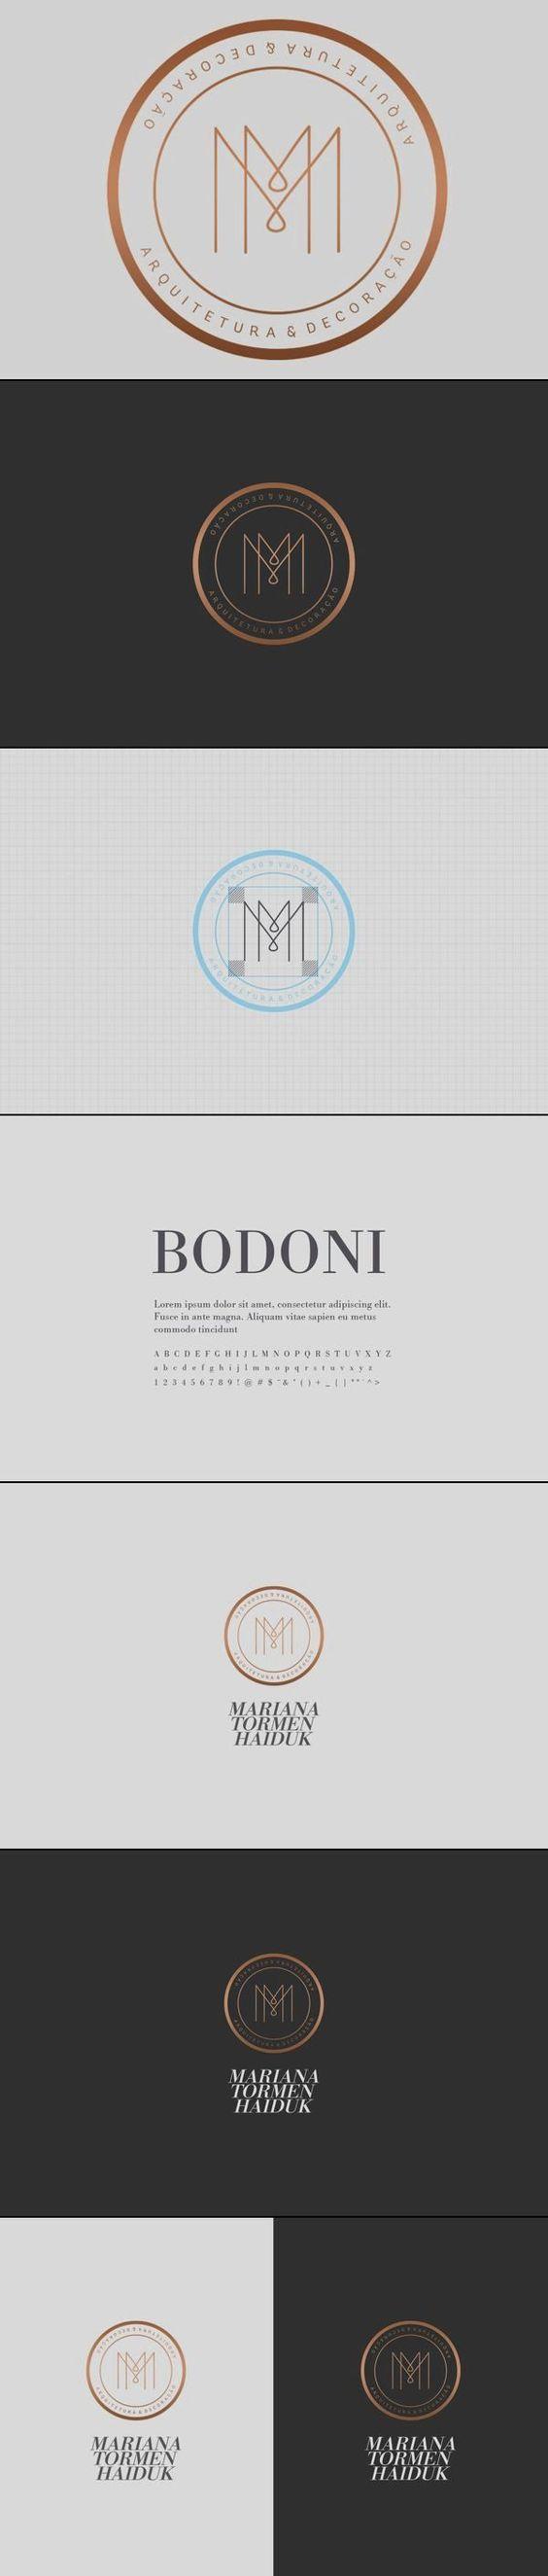 note mariana tormen haiduk architecture logo design brand identity by estu00fadio alice via